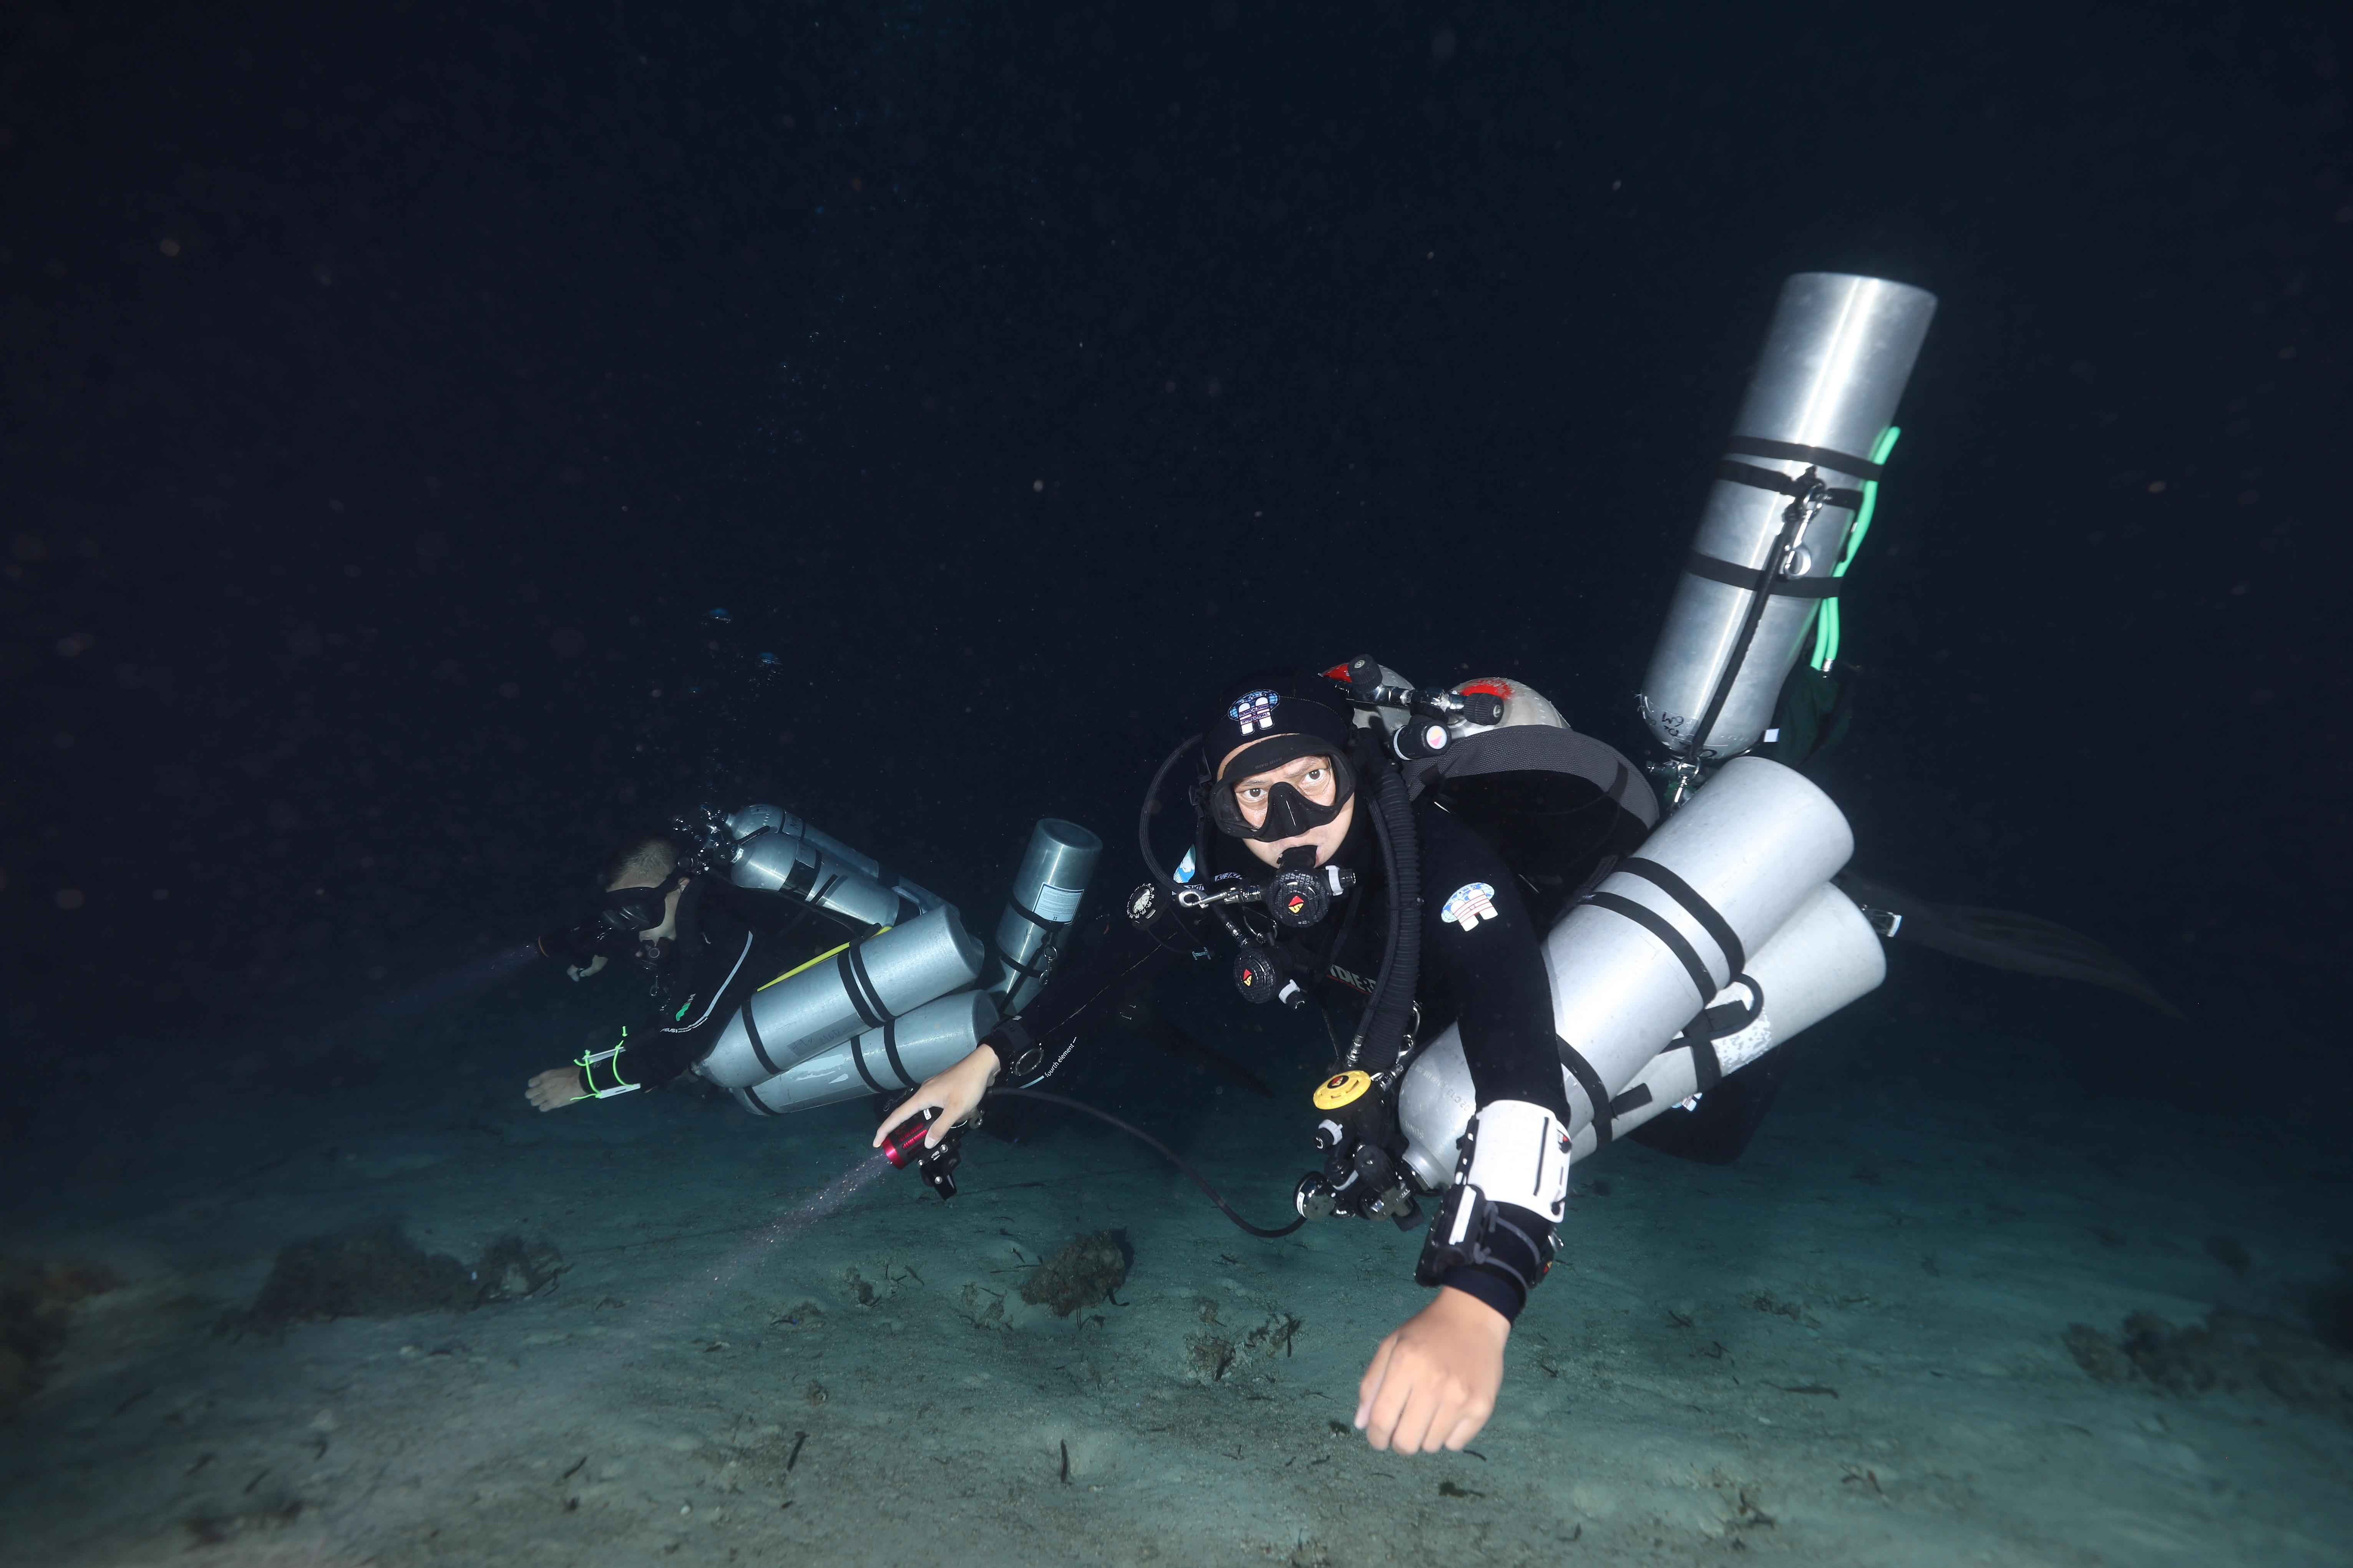 TDI Trimix Diver - 氦氮氧潛水員